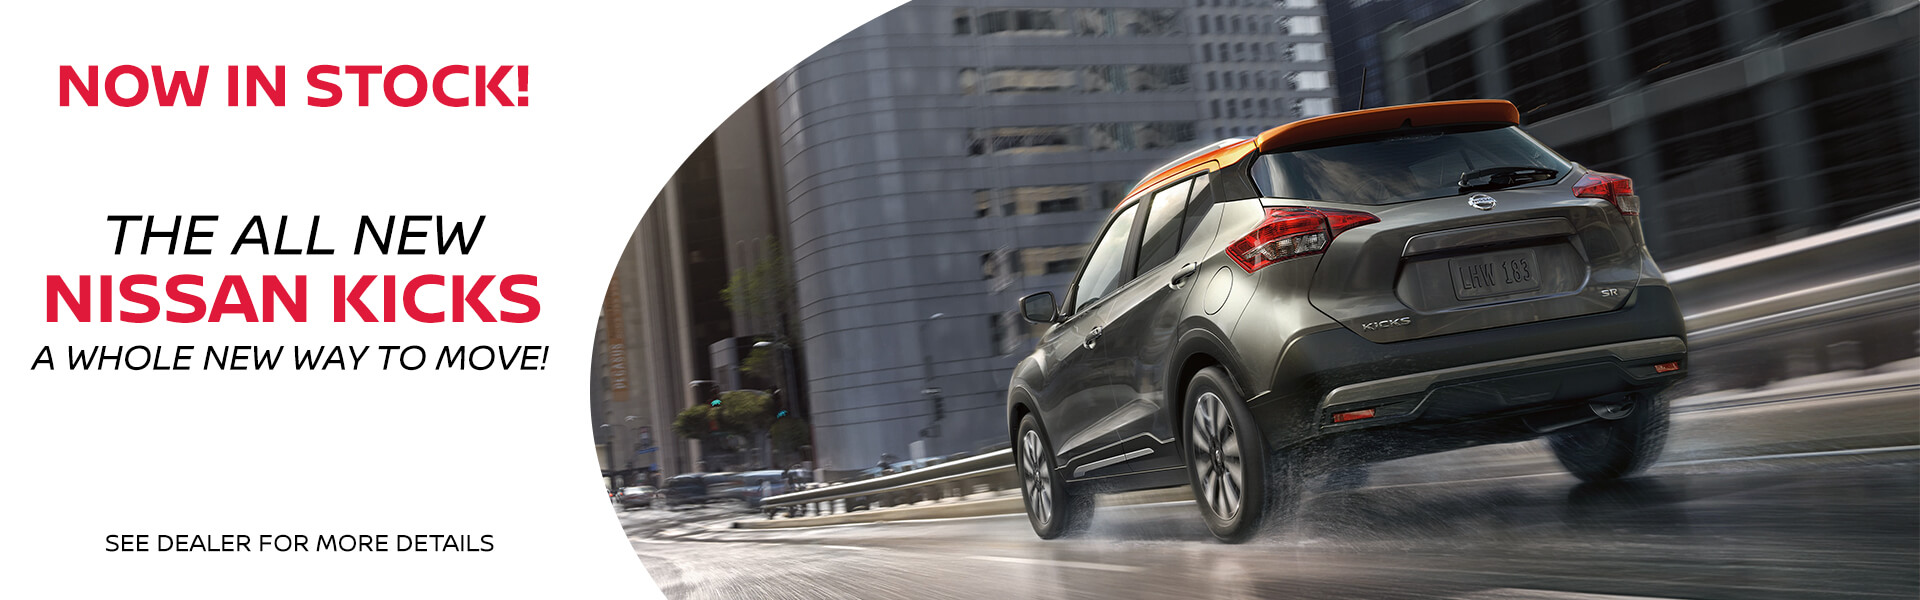 Nissan Kicks - Now in Stock